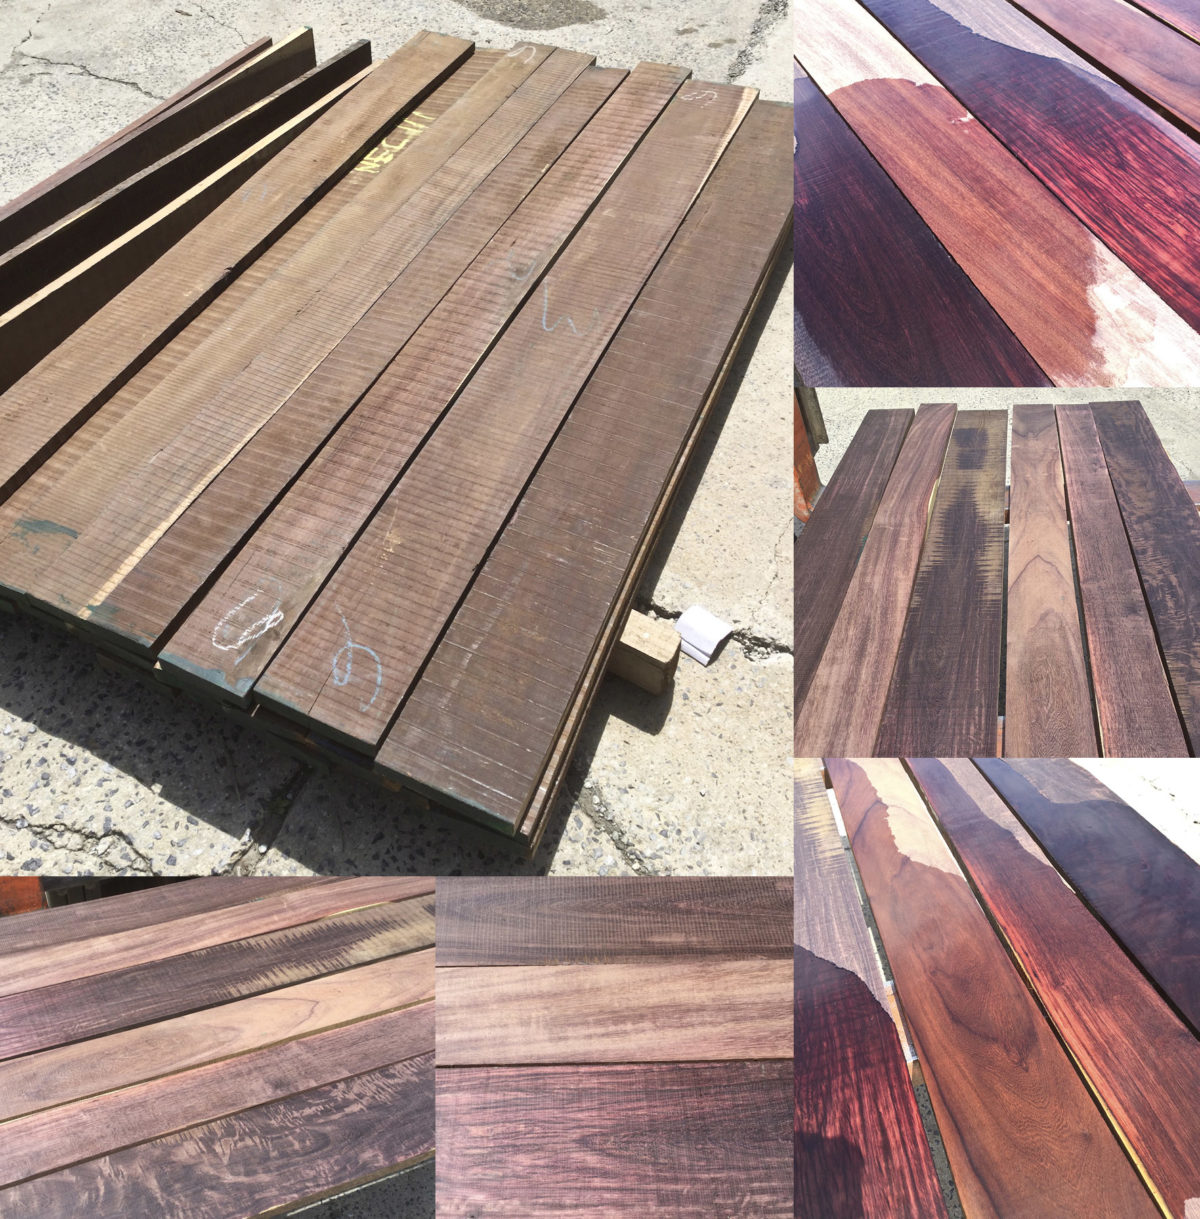 katalox, mexican ebony, wood now in stock at Hearne Hardwoods Inc.